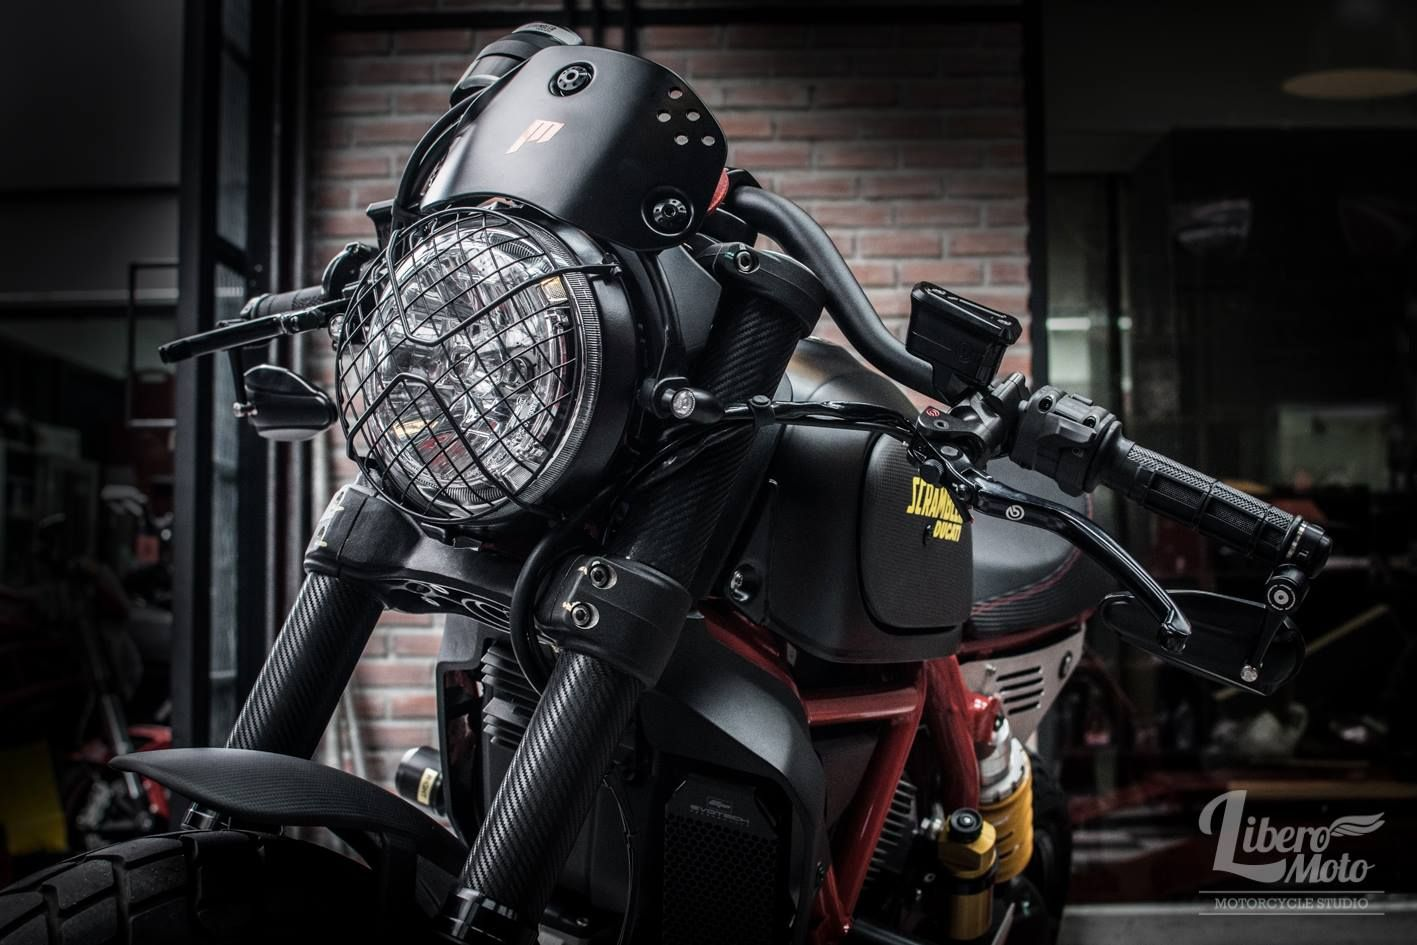 Racing Cafè: Ducati Scrambler #1 by LiberoMoto